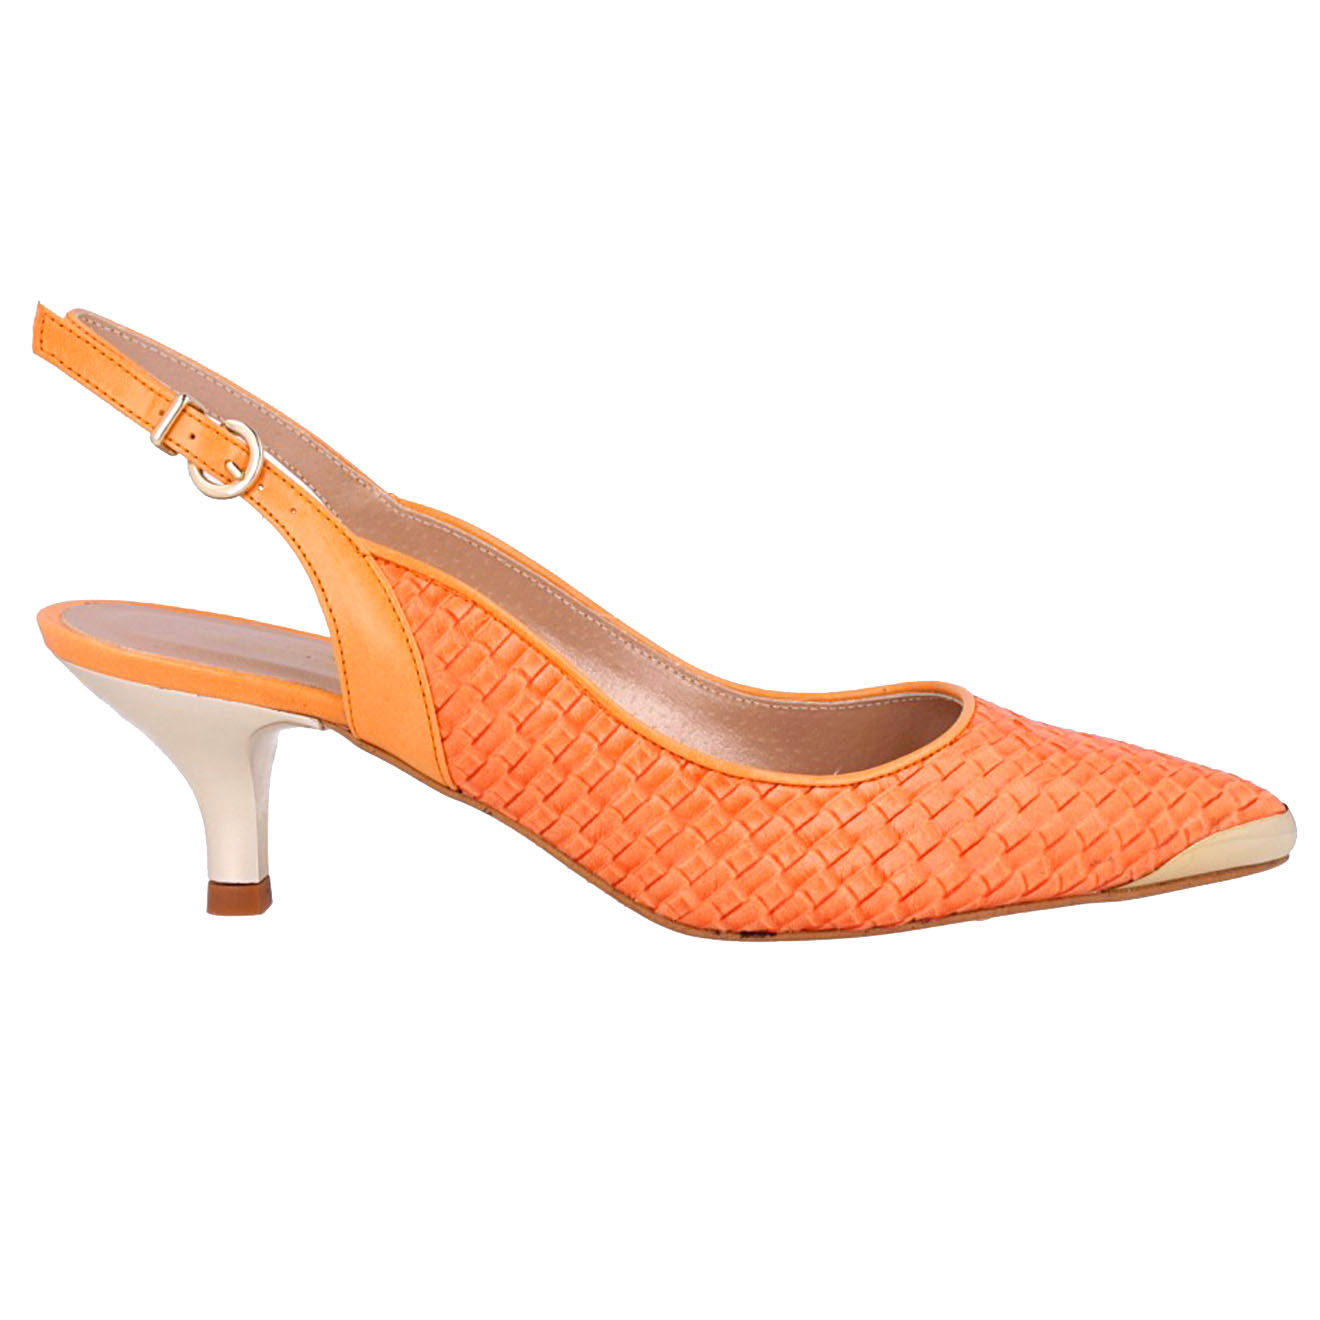 Sling-Back tressés en Cuir orange Talon 5 cm - Roberto Botella - Modalova